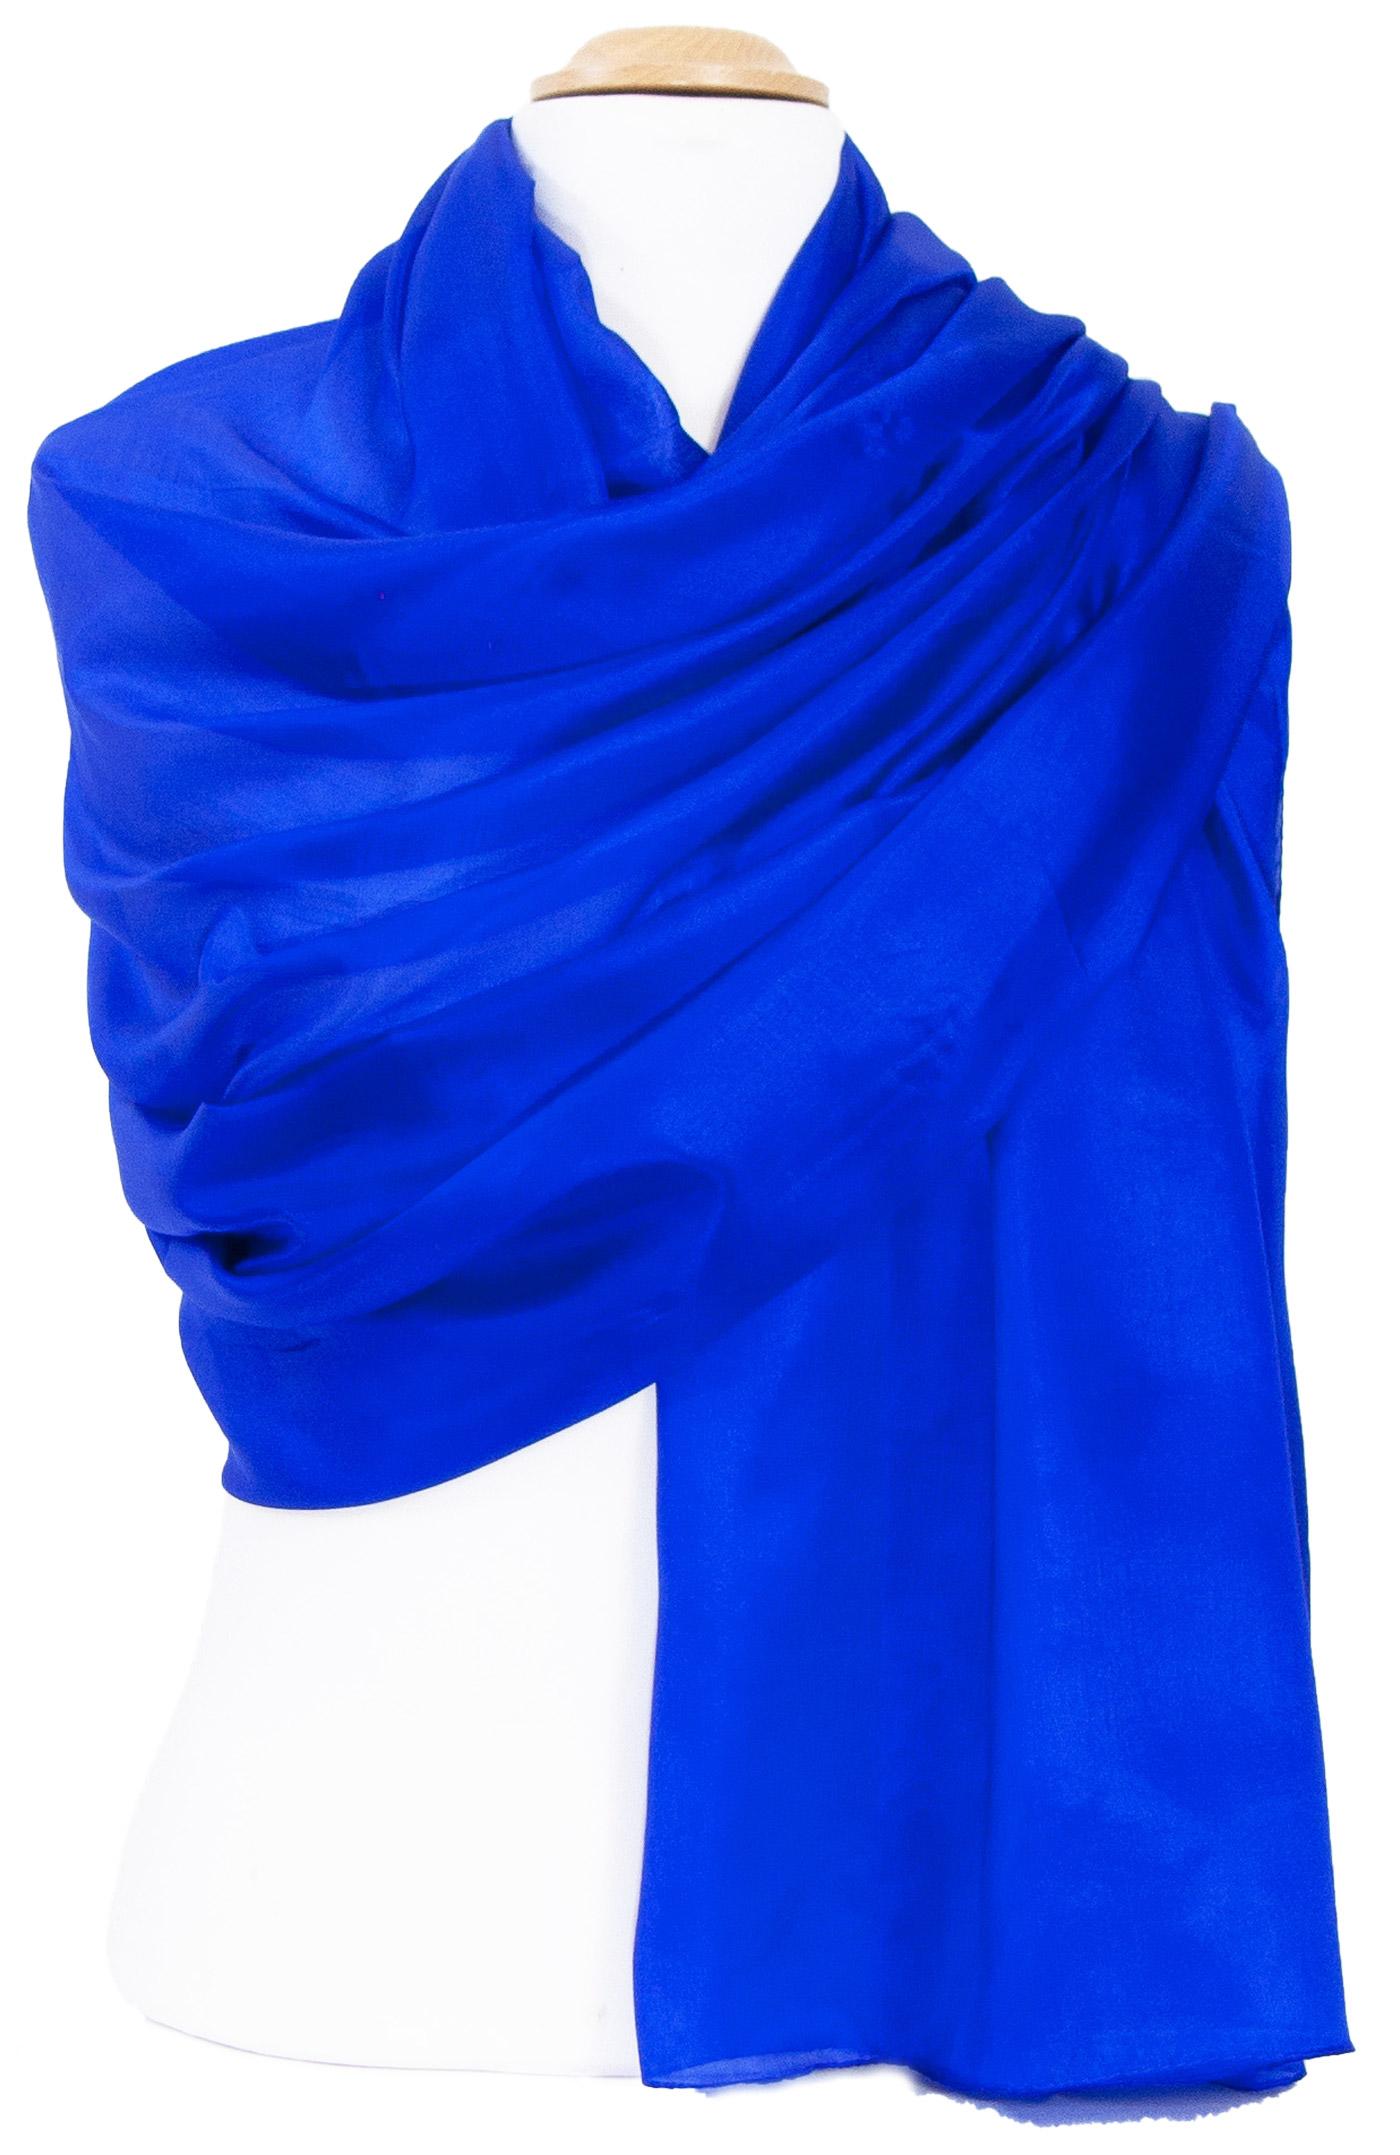 Etole en soie bleu roi premium